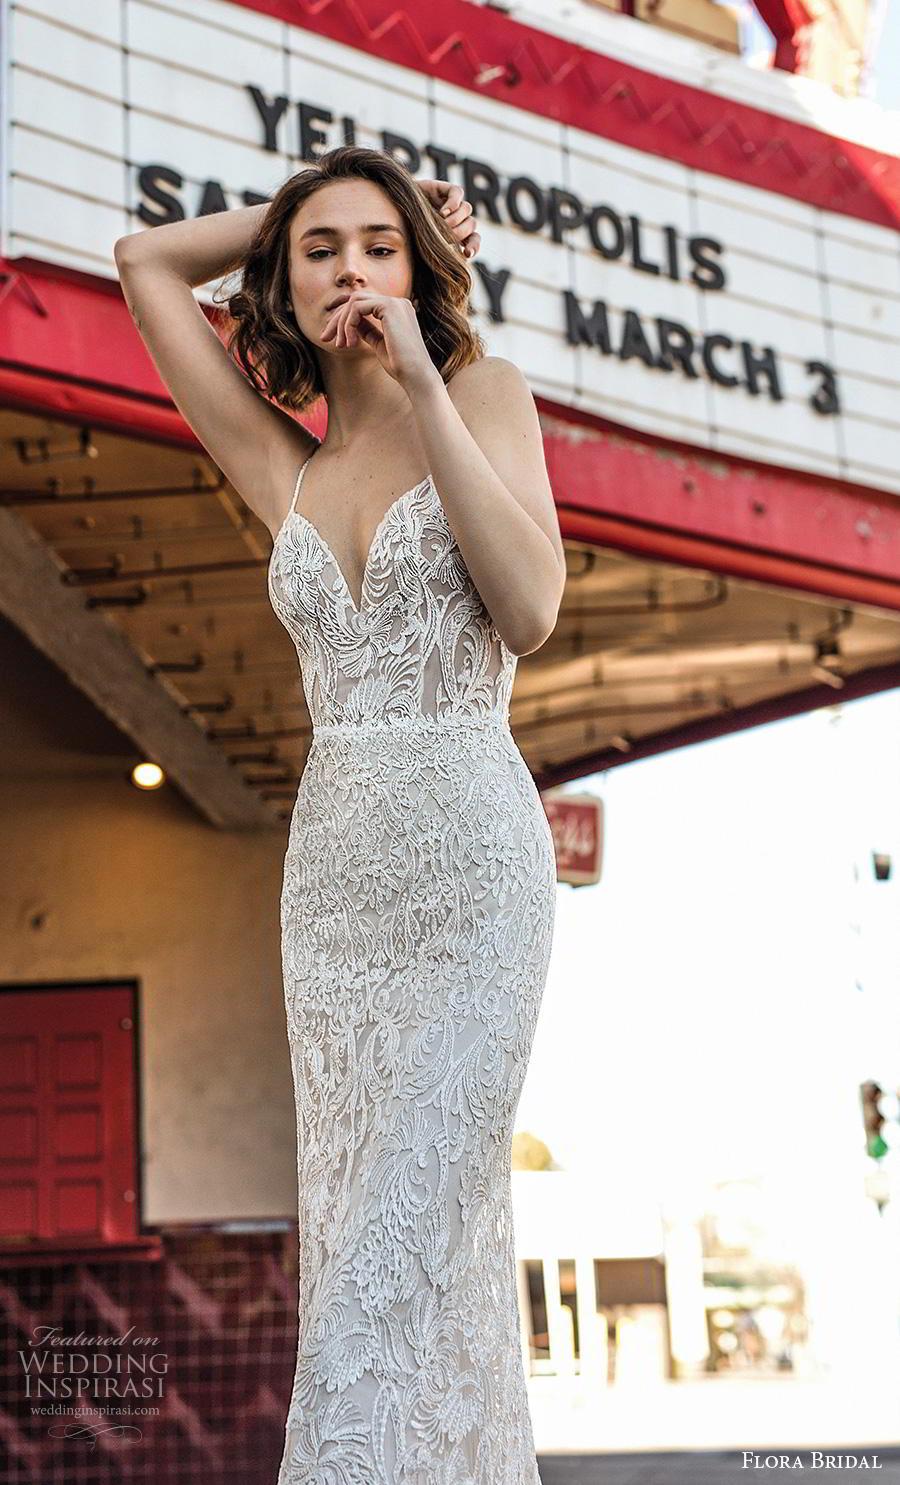 flora bridal 2019 bridal sleeveless spaghetti strap diamond neckline full embellishment sexy elegant sheath wedding dress backless scoop back chapel train (11) zv